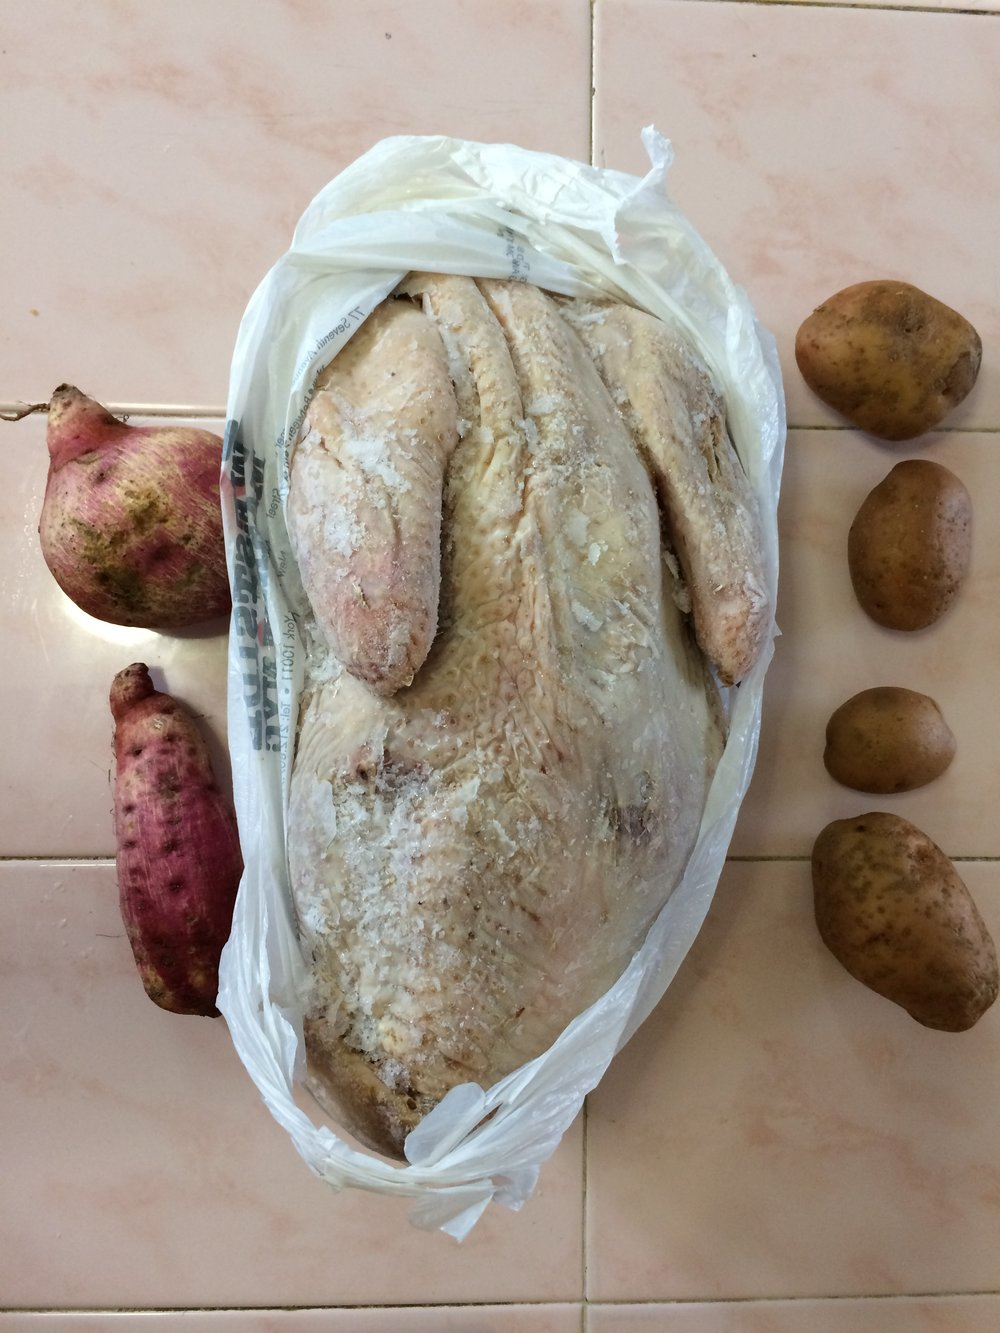 My purple sweet potatoes, a skinny Cuban turkey, and black market potatoes.